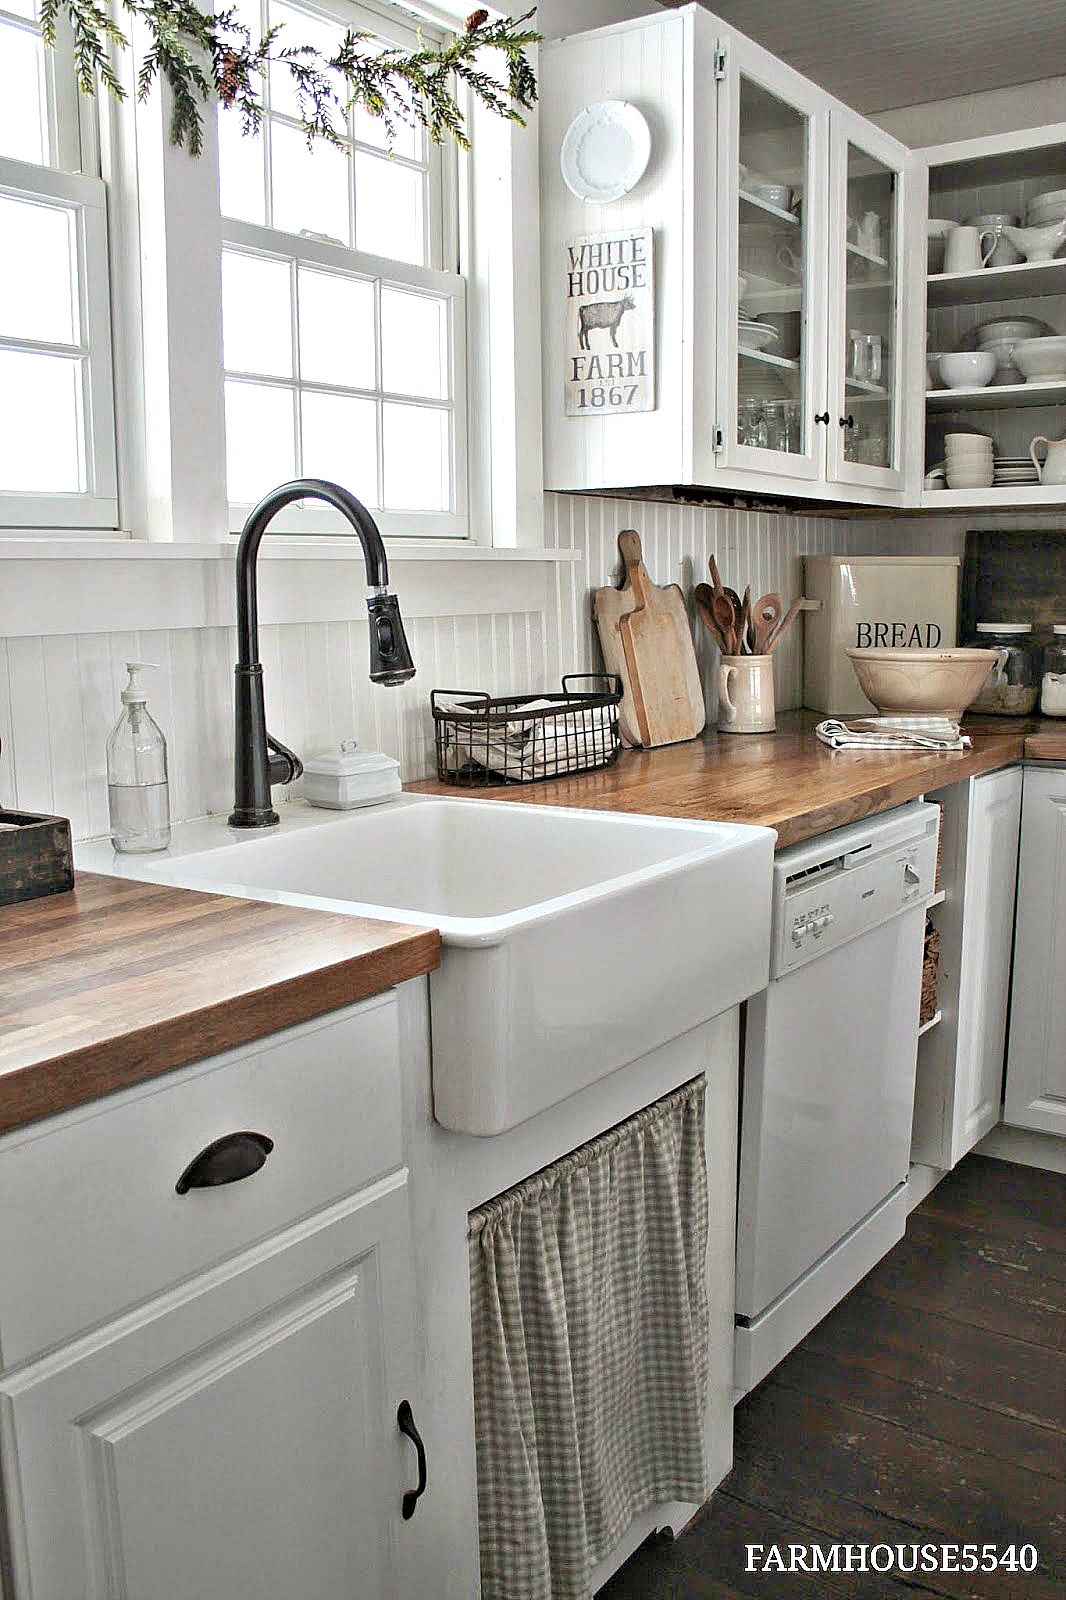 Farmhouse Kitchen Decor Ideas | The 36th AVENUE on Farmhouse Kitchen Ideas  id=91674